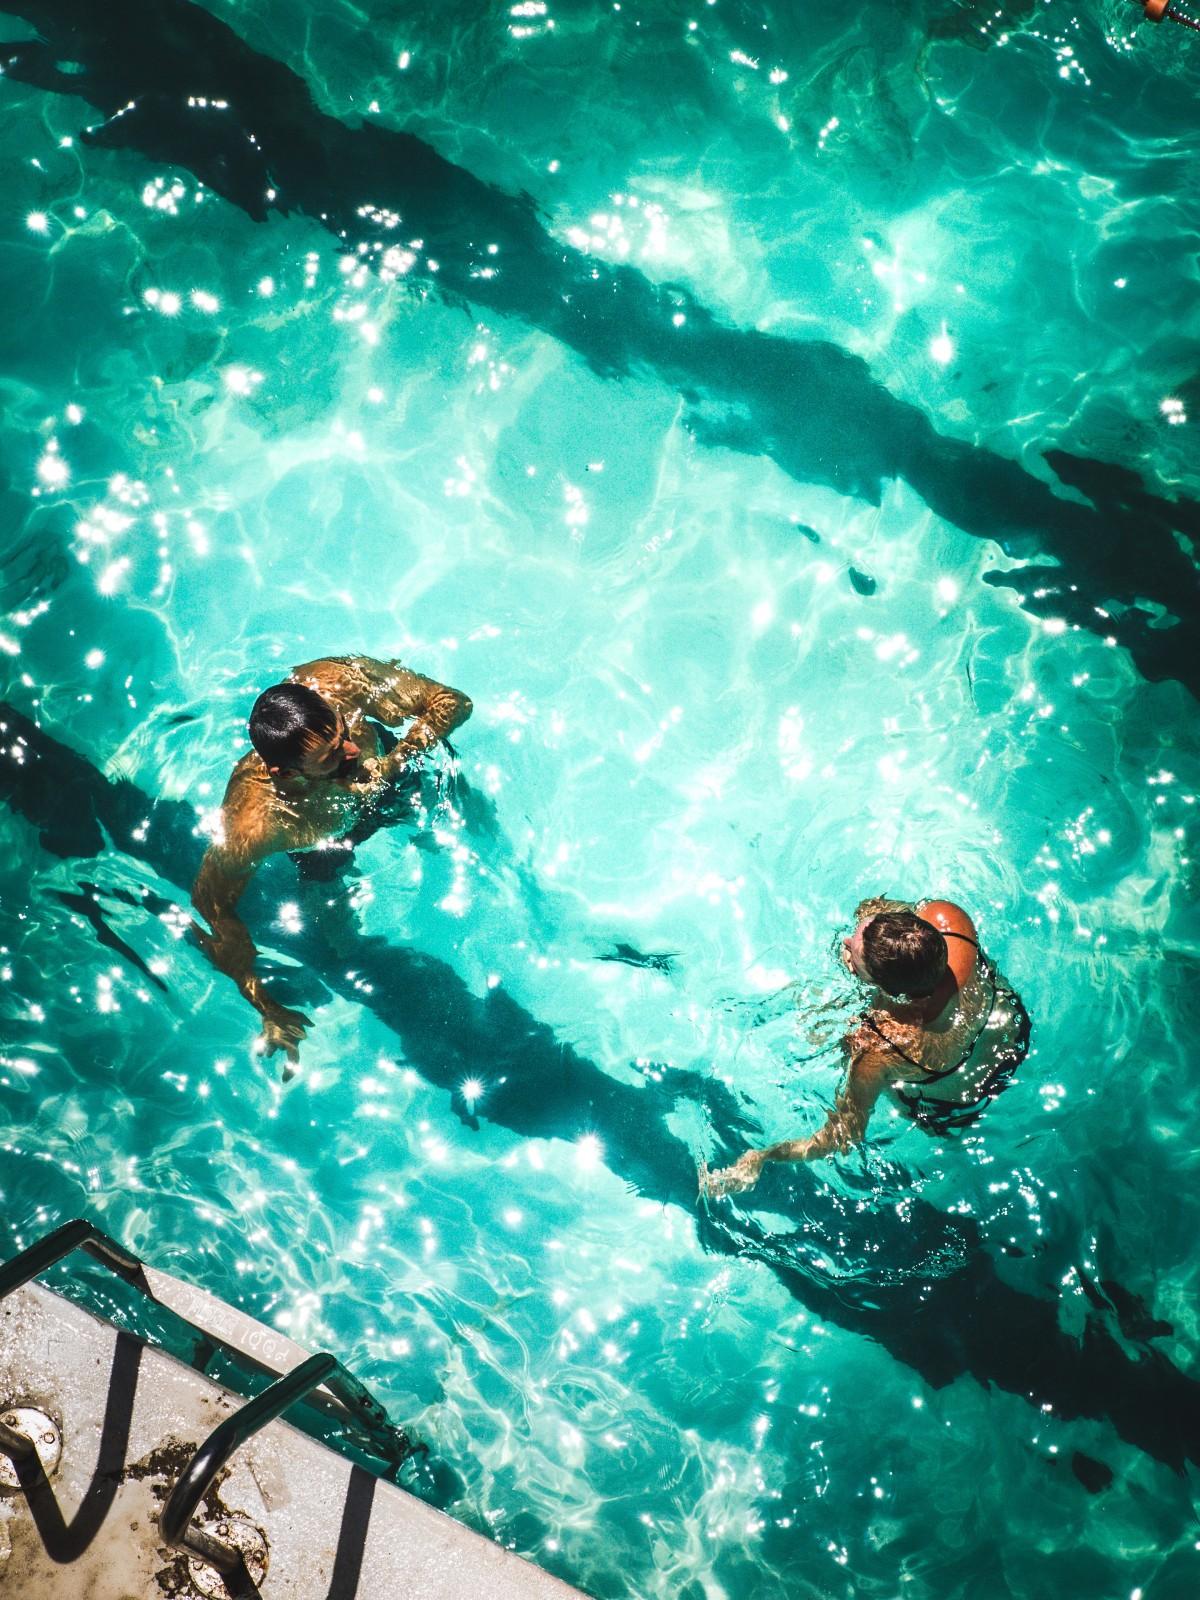 Free Images Sea Person Underwater Swim Extreme Sport